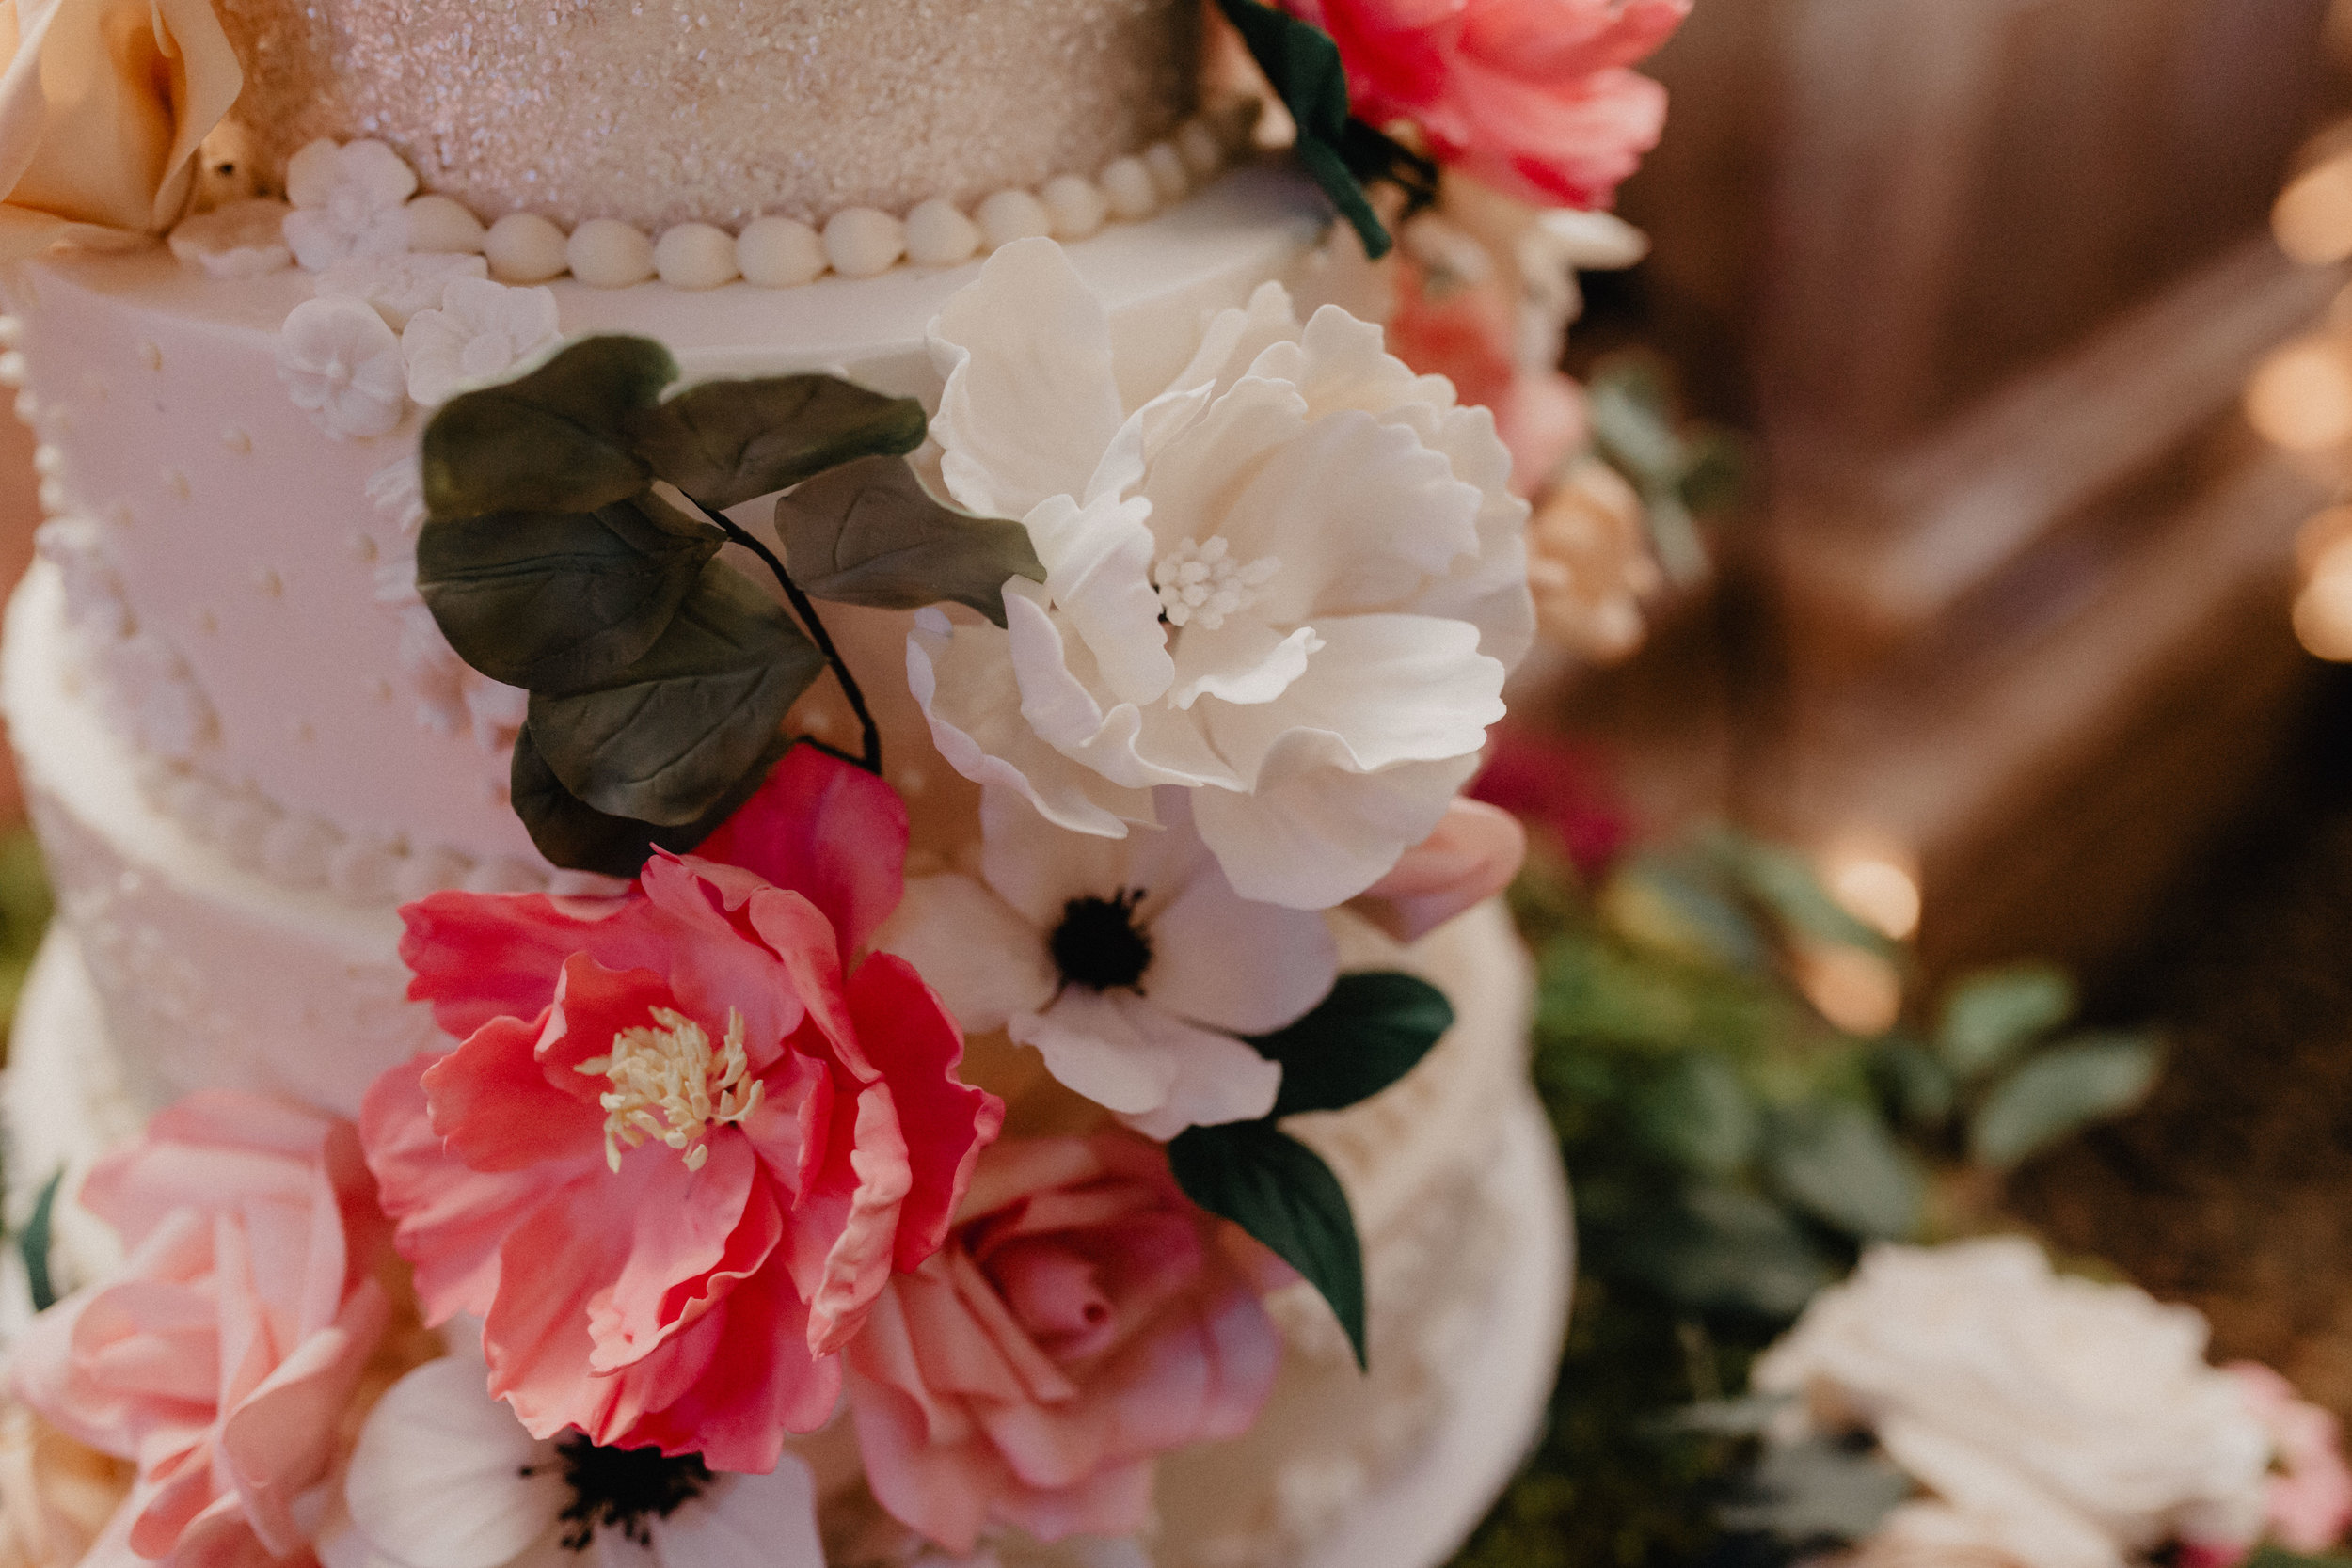 albany-new-york-wedding-45.jpg